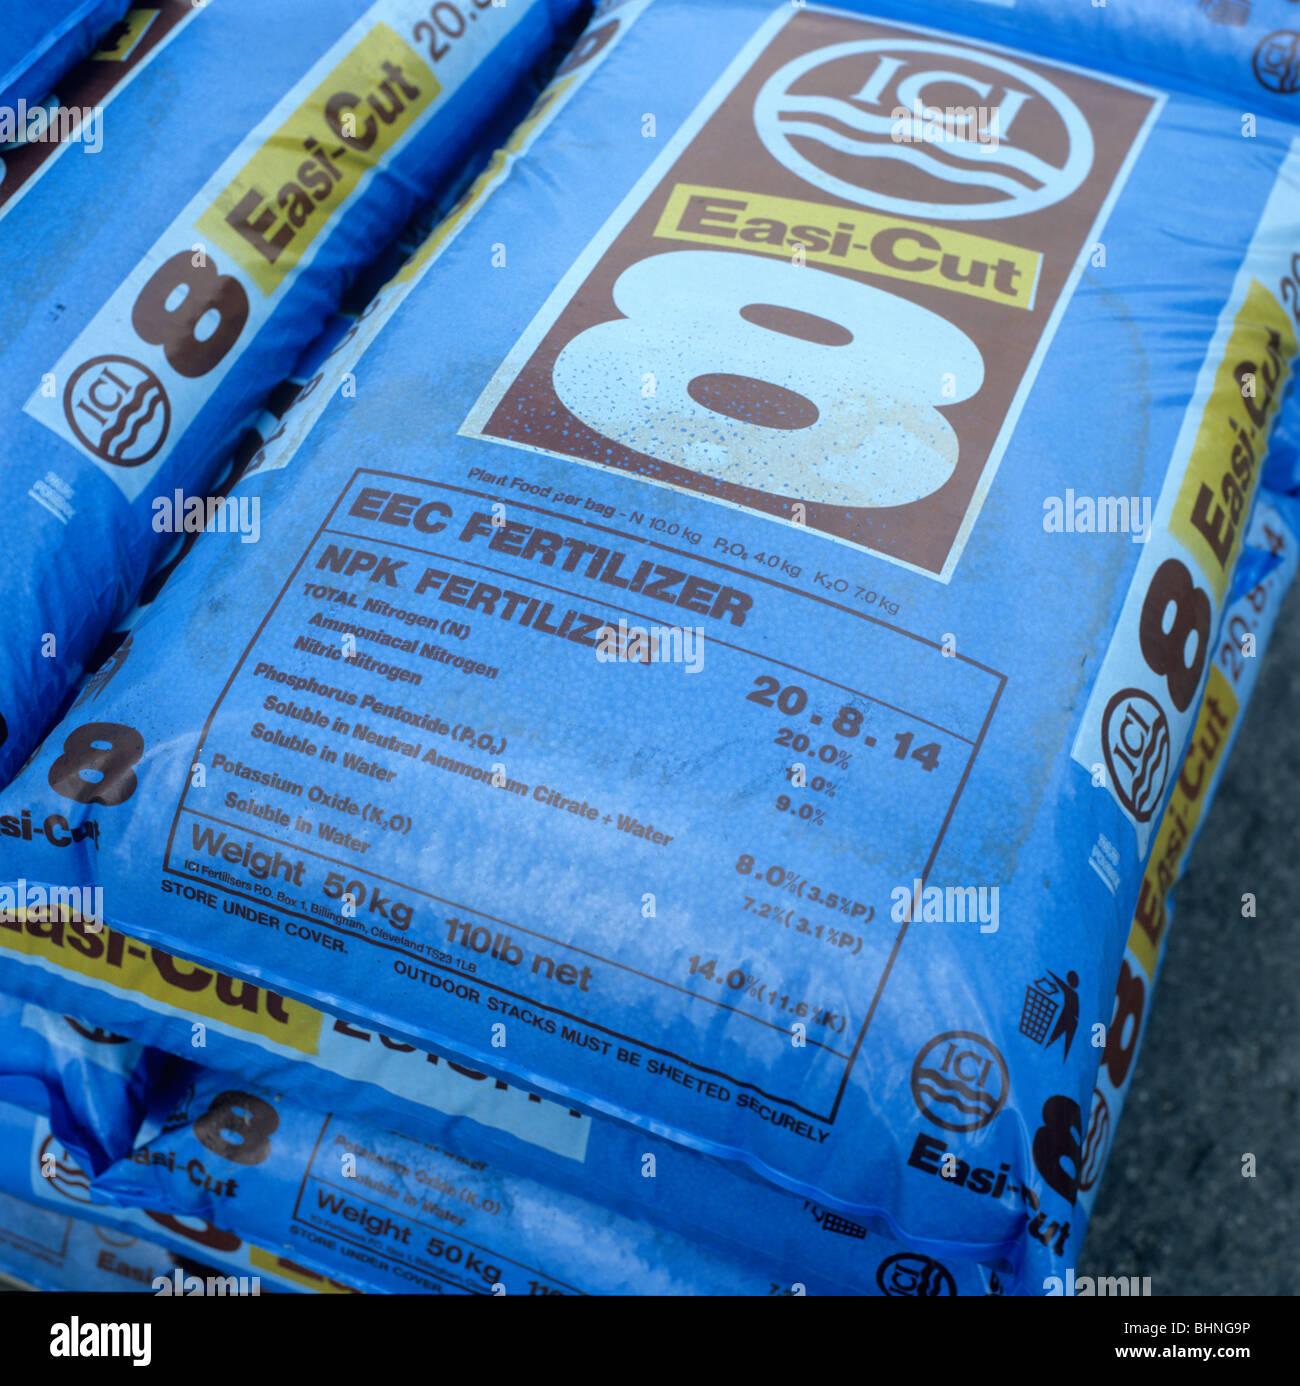 Plastic bag of N P K fertilizer used for agricultural crops - Stock Image